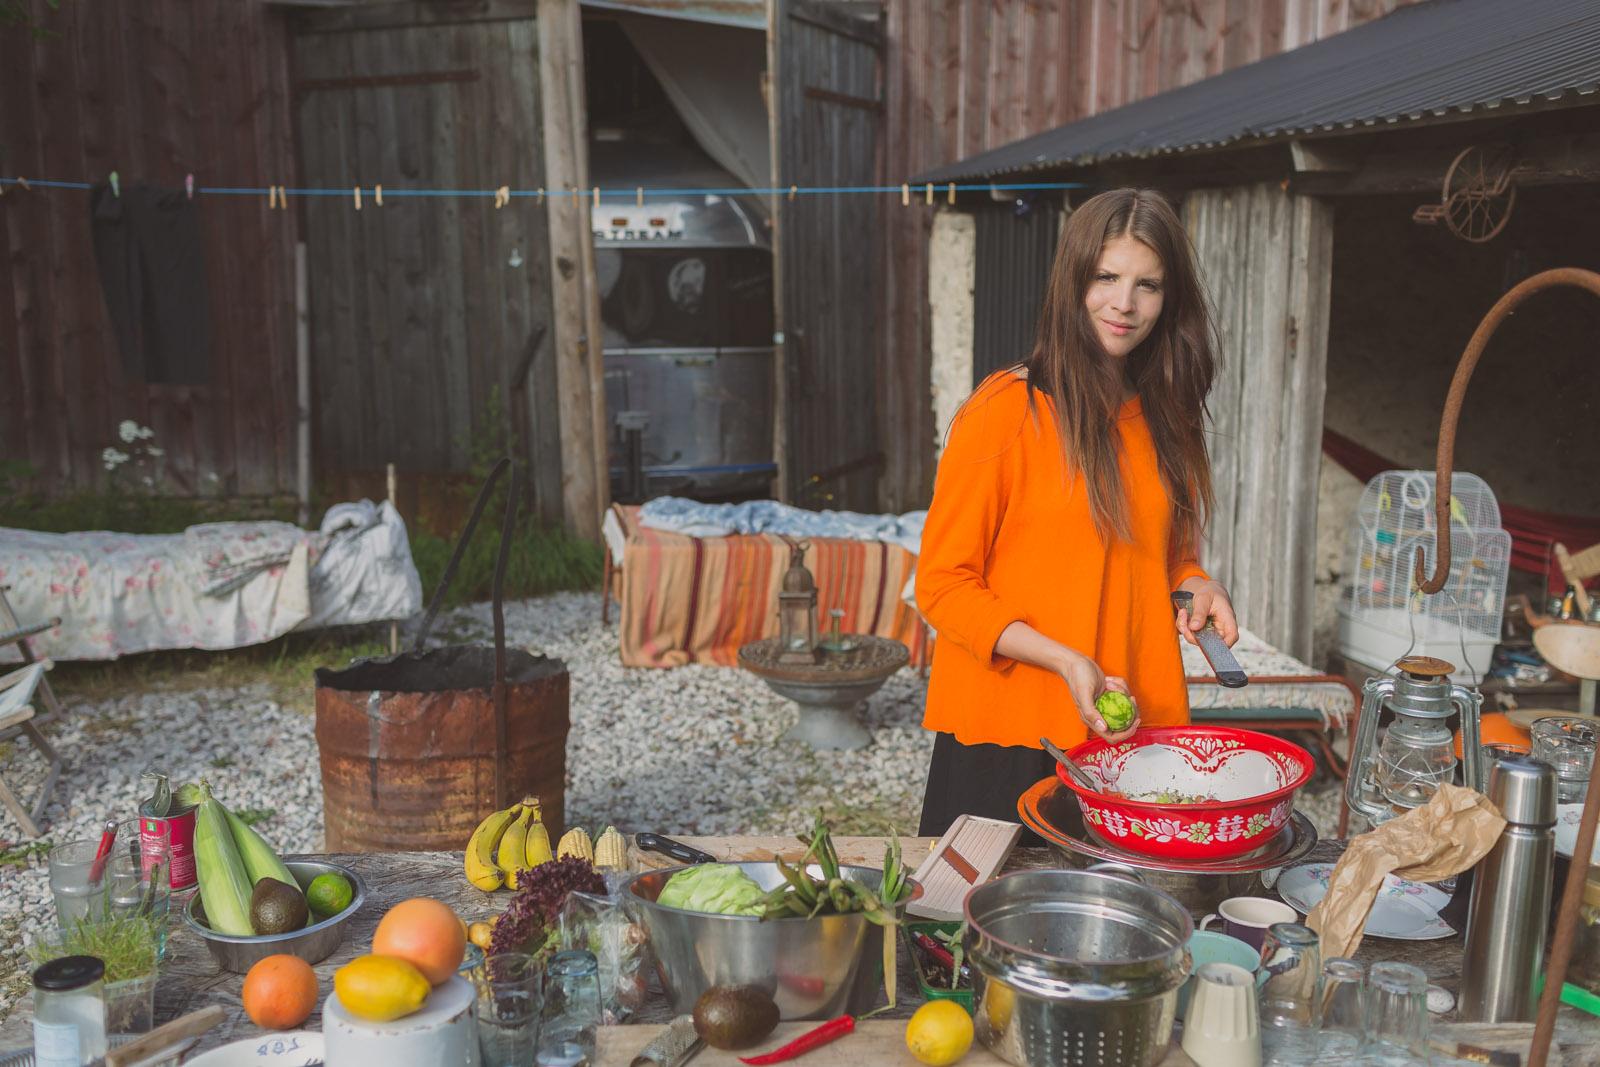 Josefine Jäger - Portrait photographer - Porträttfotograf - Lifestyle photographer - Lifestylefotograf